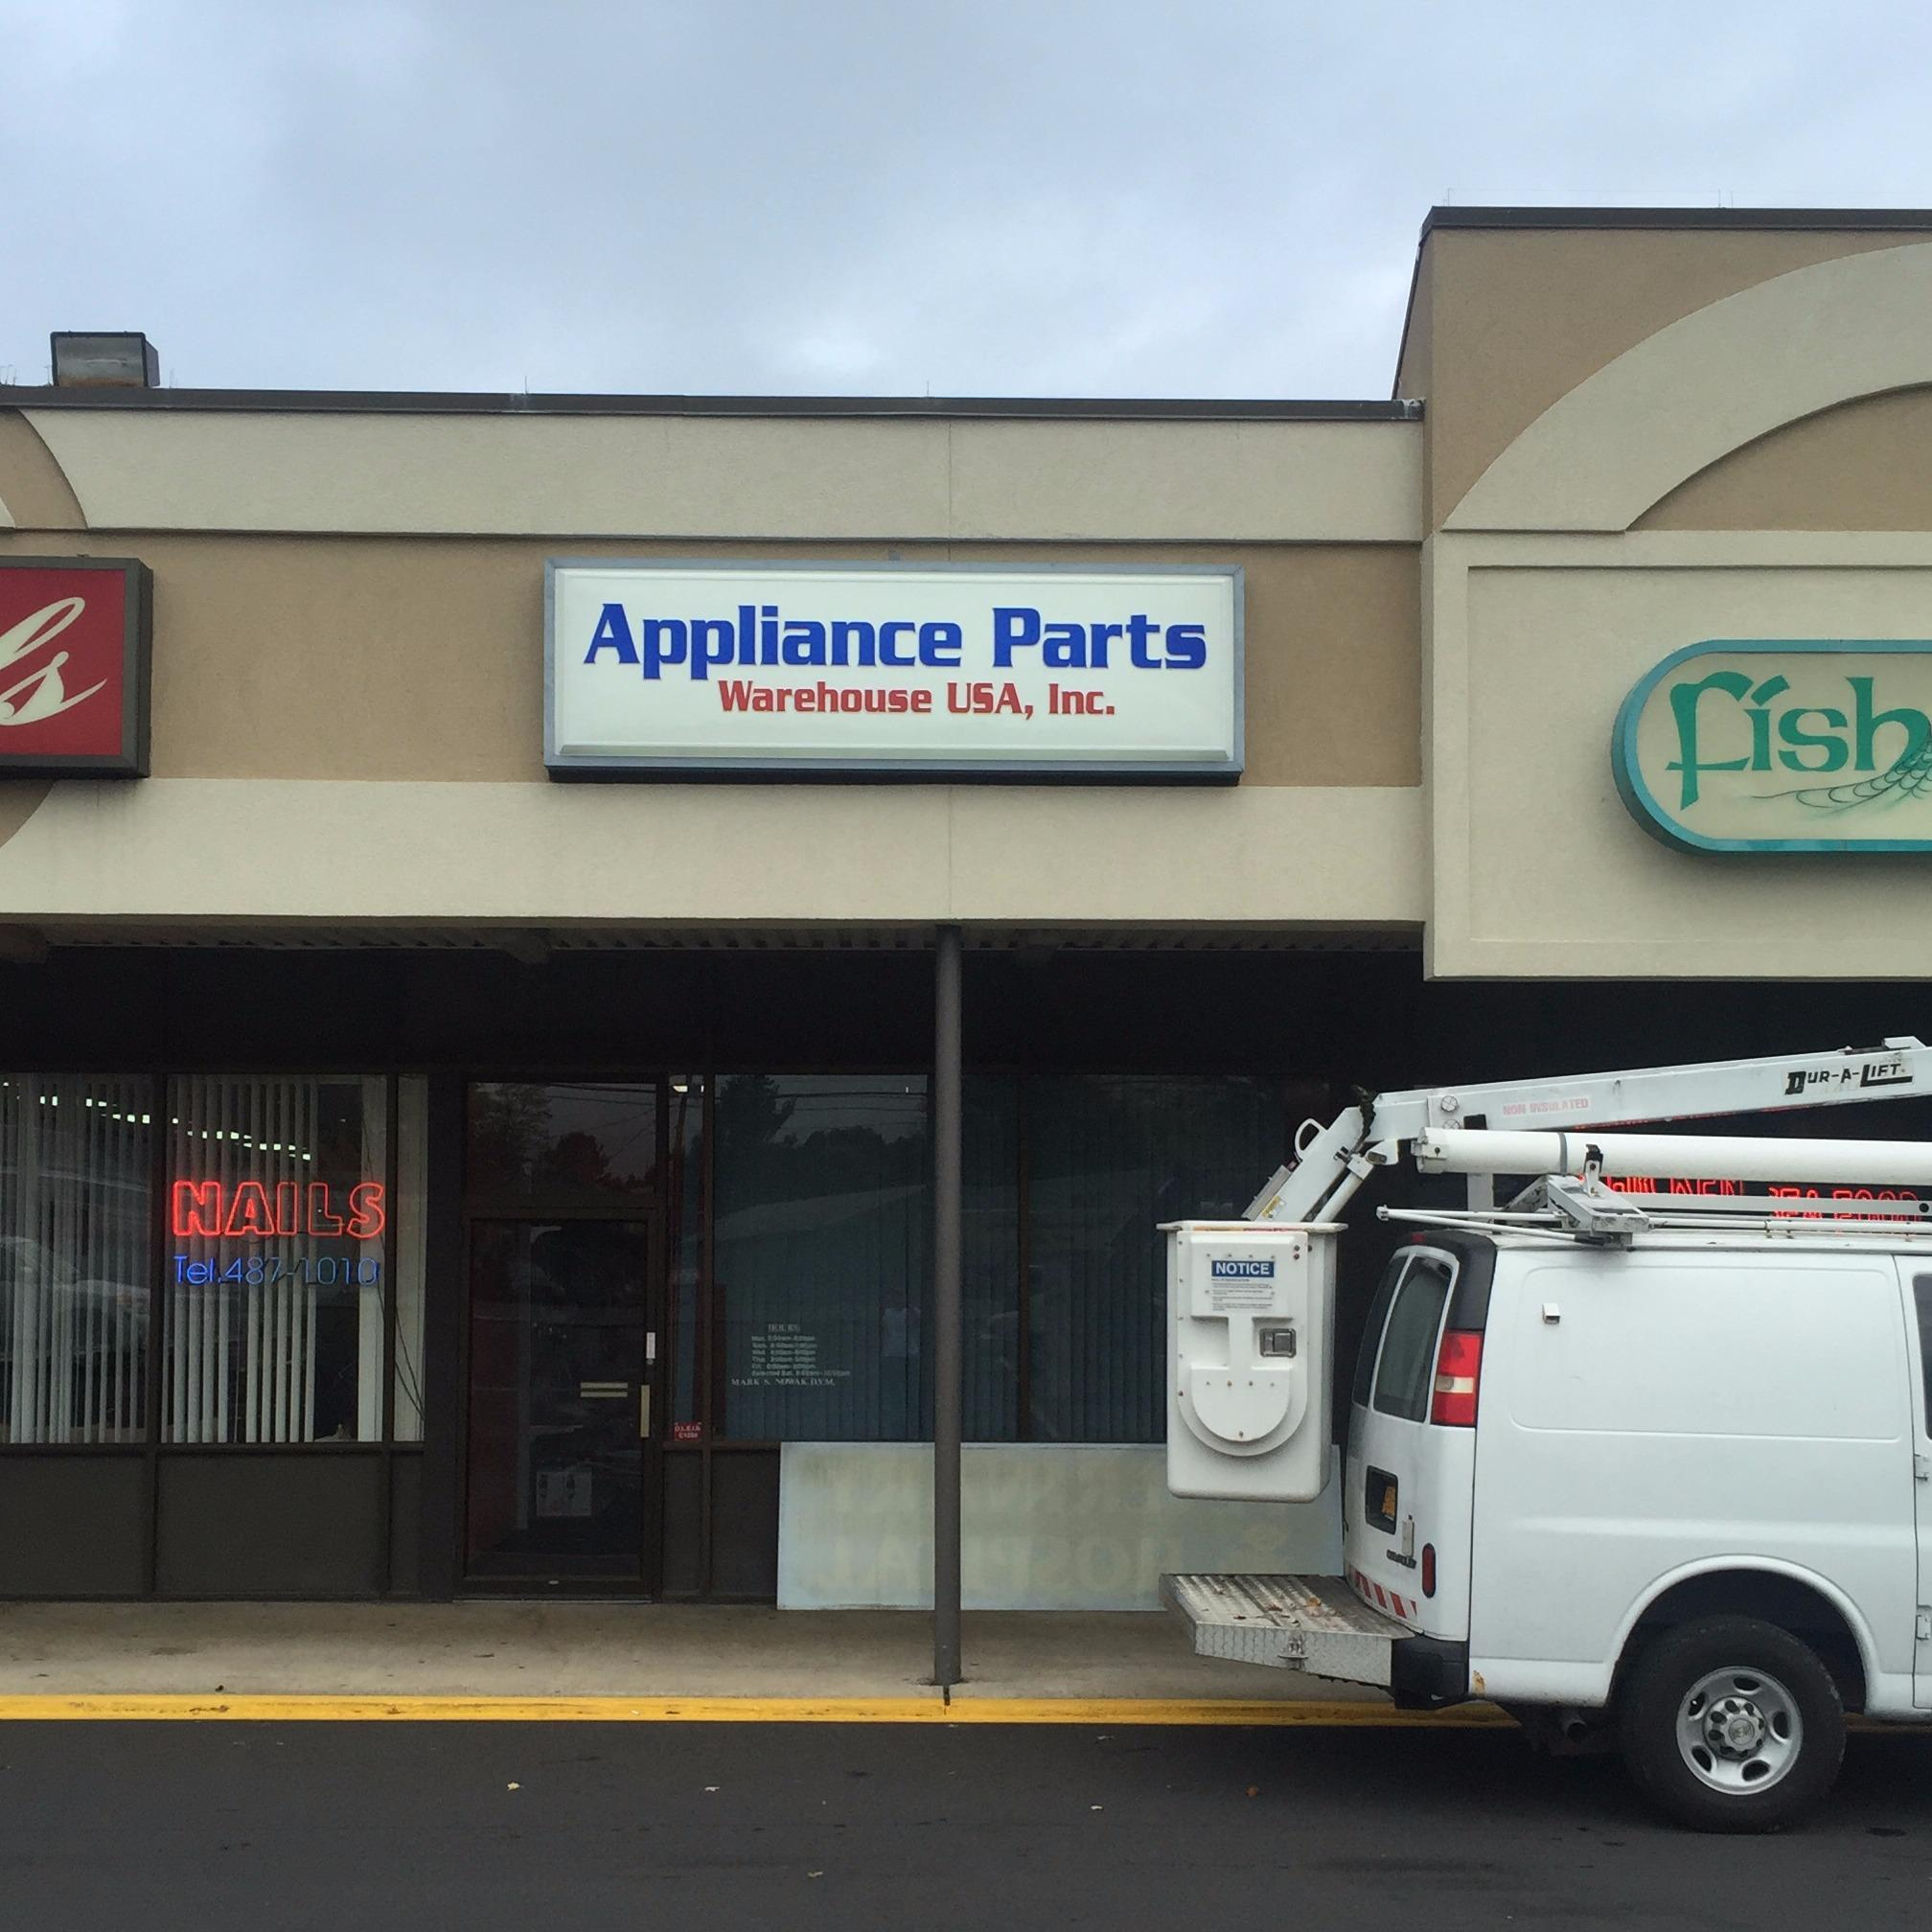 Appliance Parts Warehouse USA, Inc. - Syracuse, NY - Appliance Stores